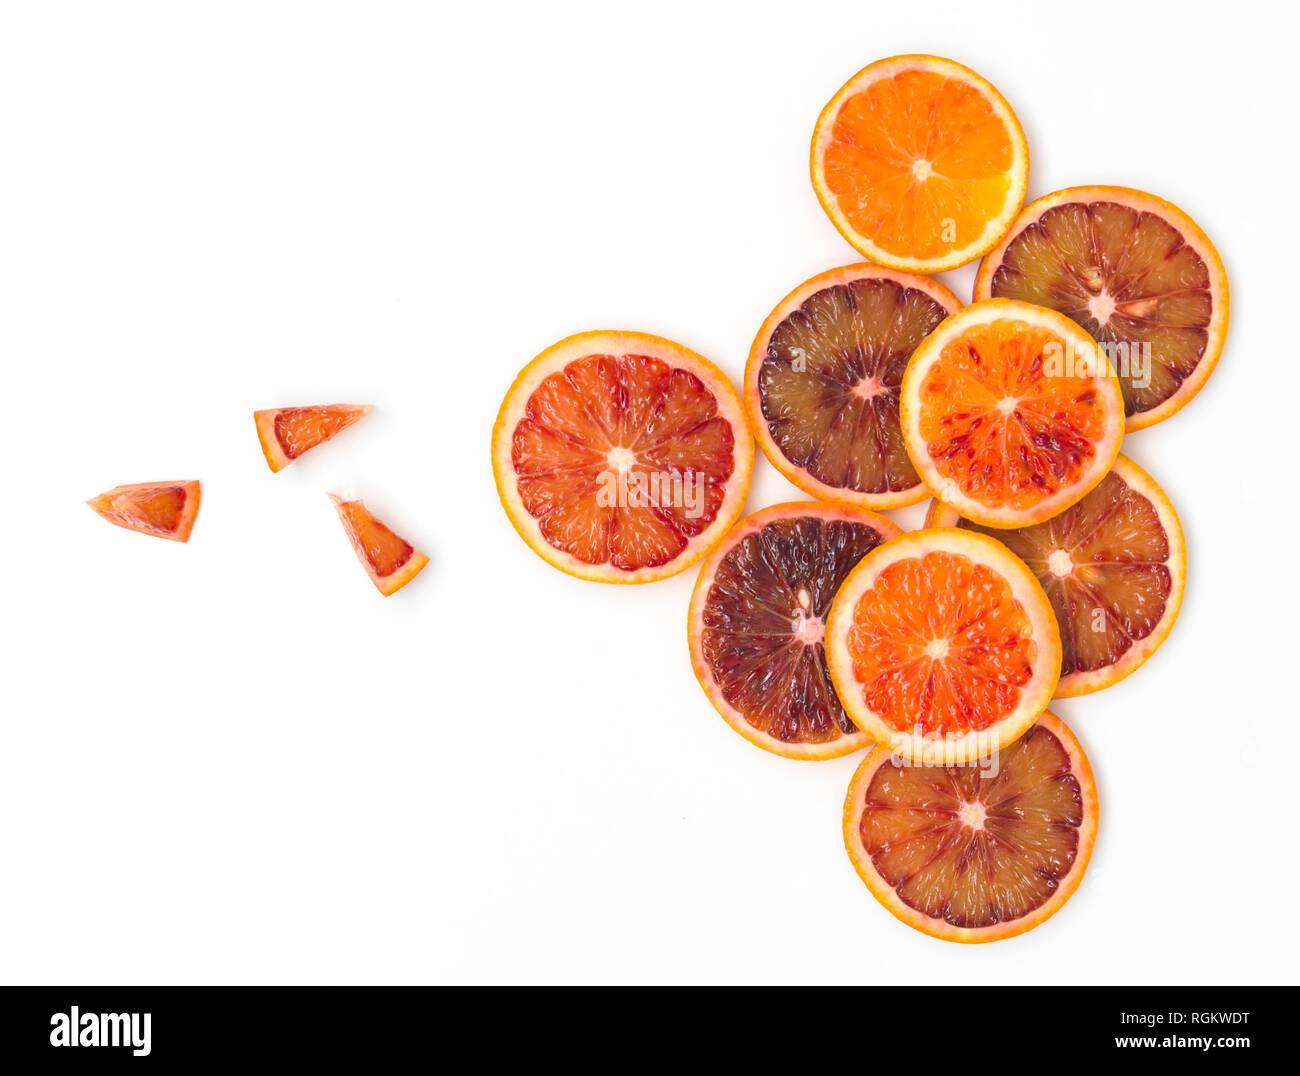 many fresh slices of blood oranges lie beautifully arranged on a white background - Stock Image